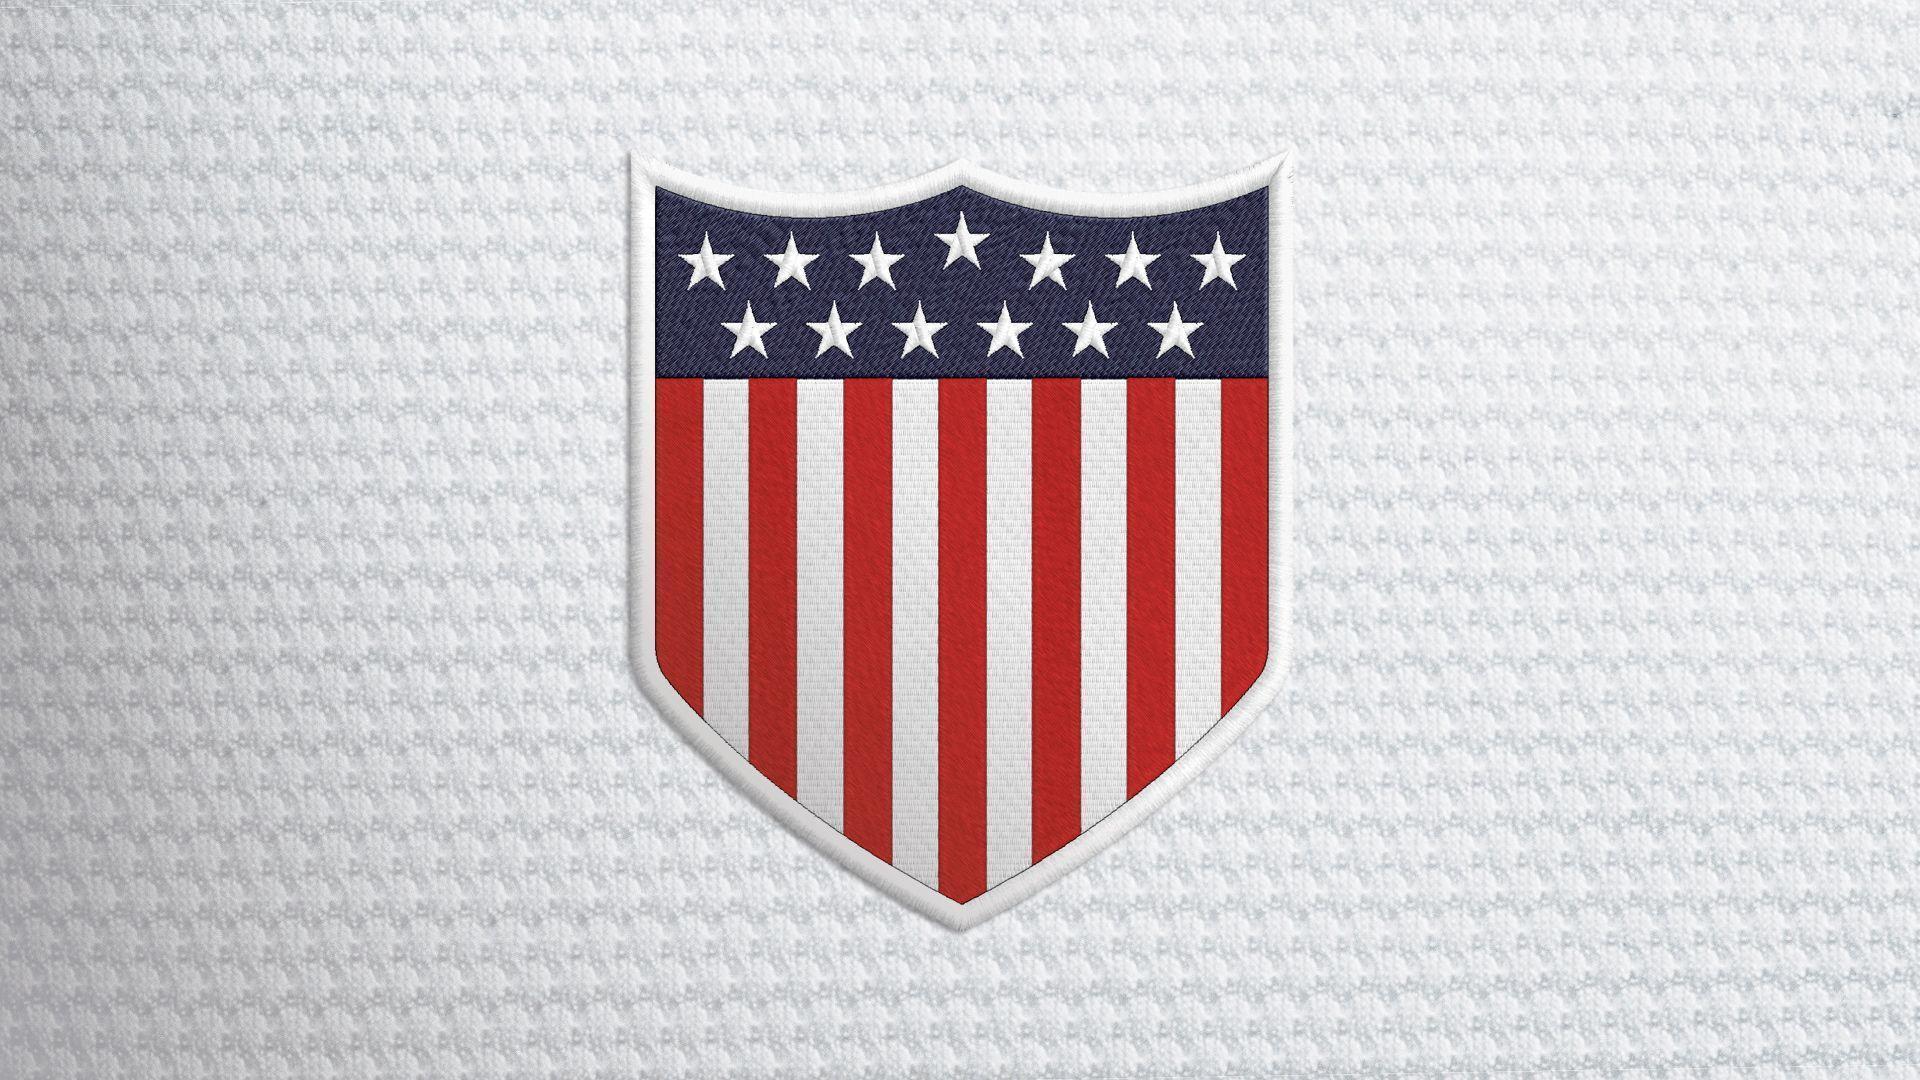 Usa Soccer Wallpapers: Usa Soccer Logo 2015 Wallpapers